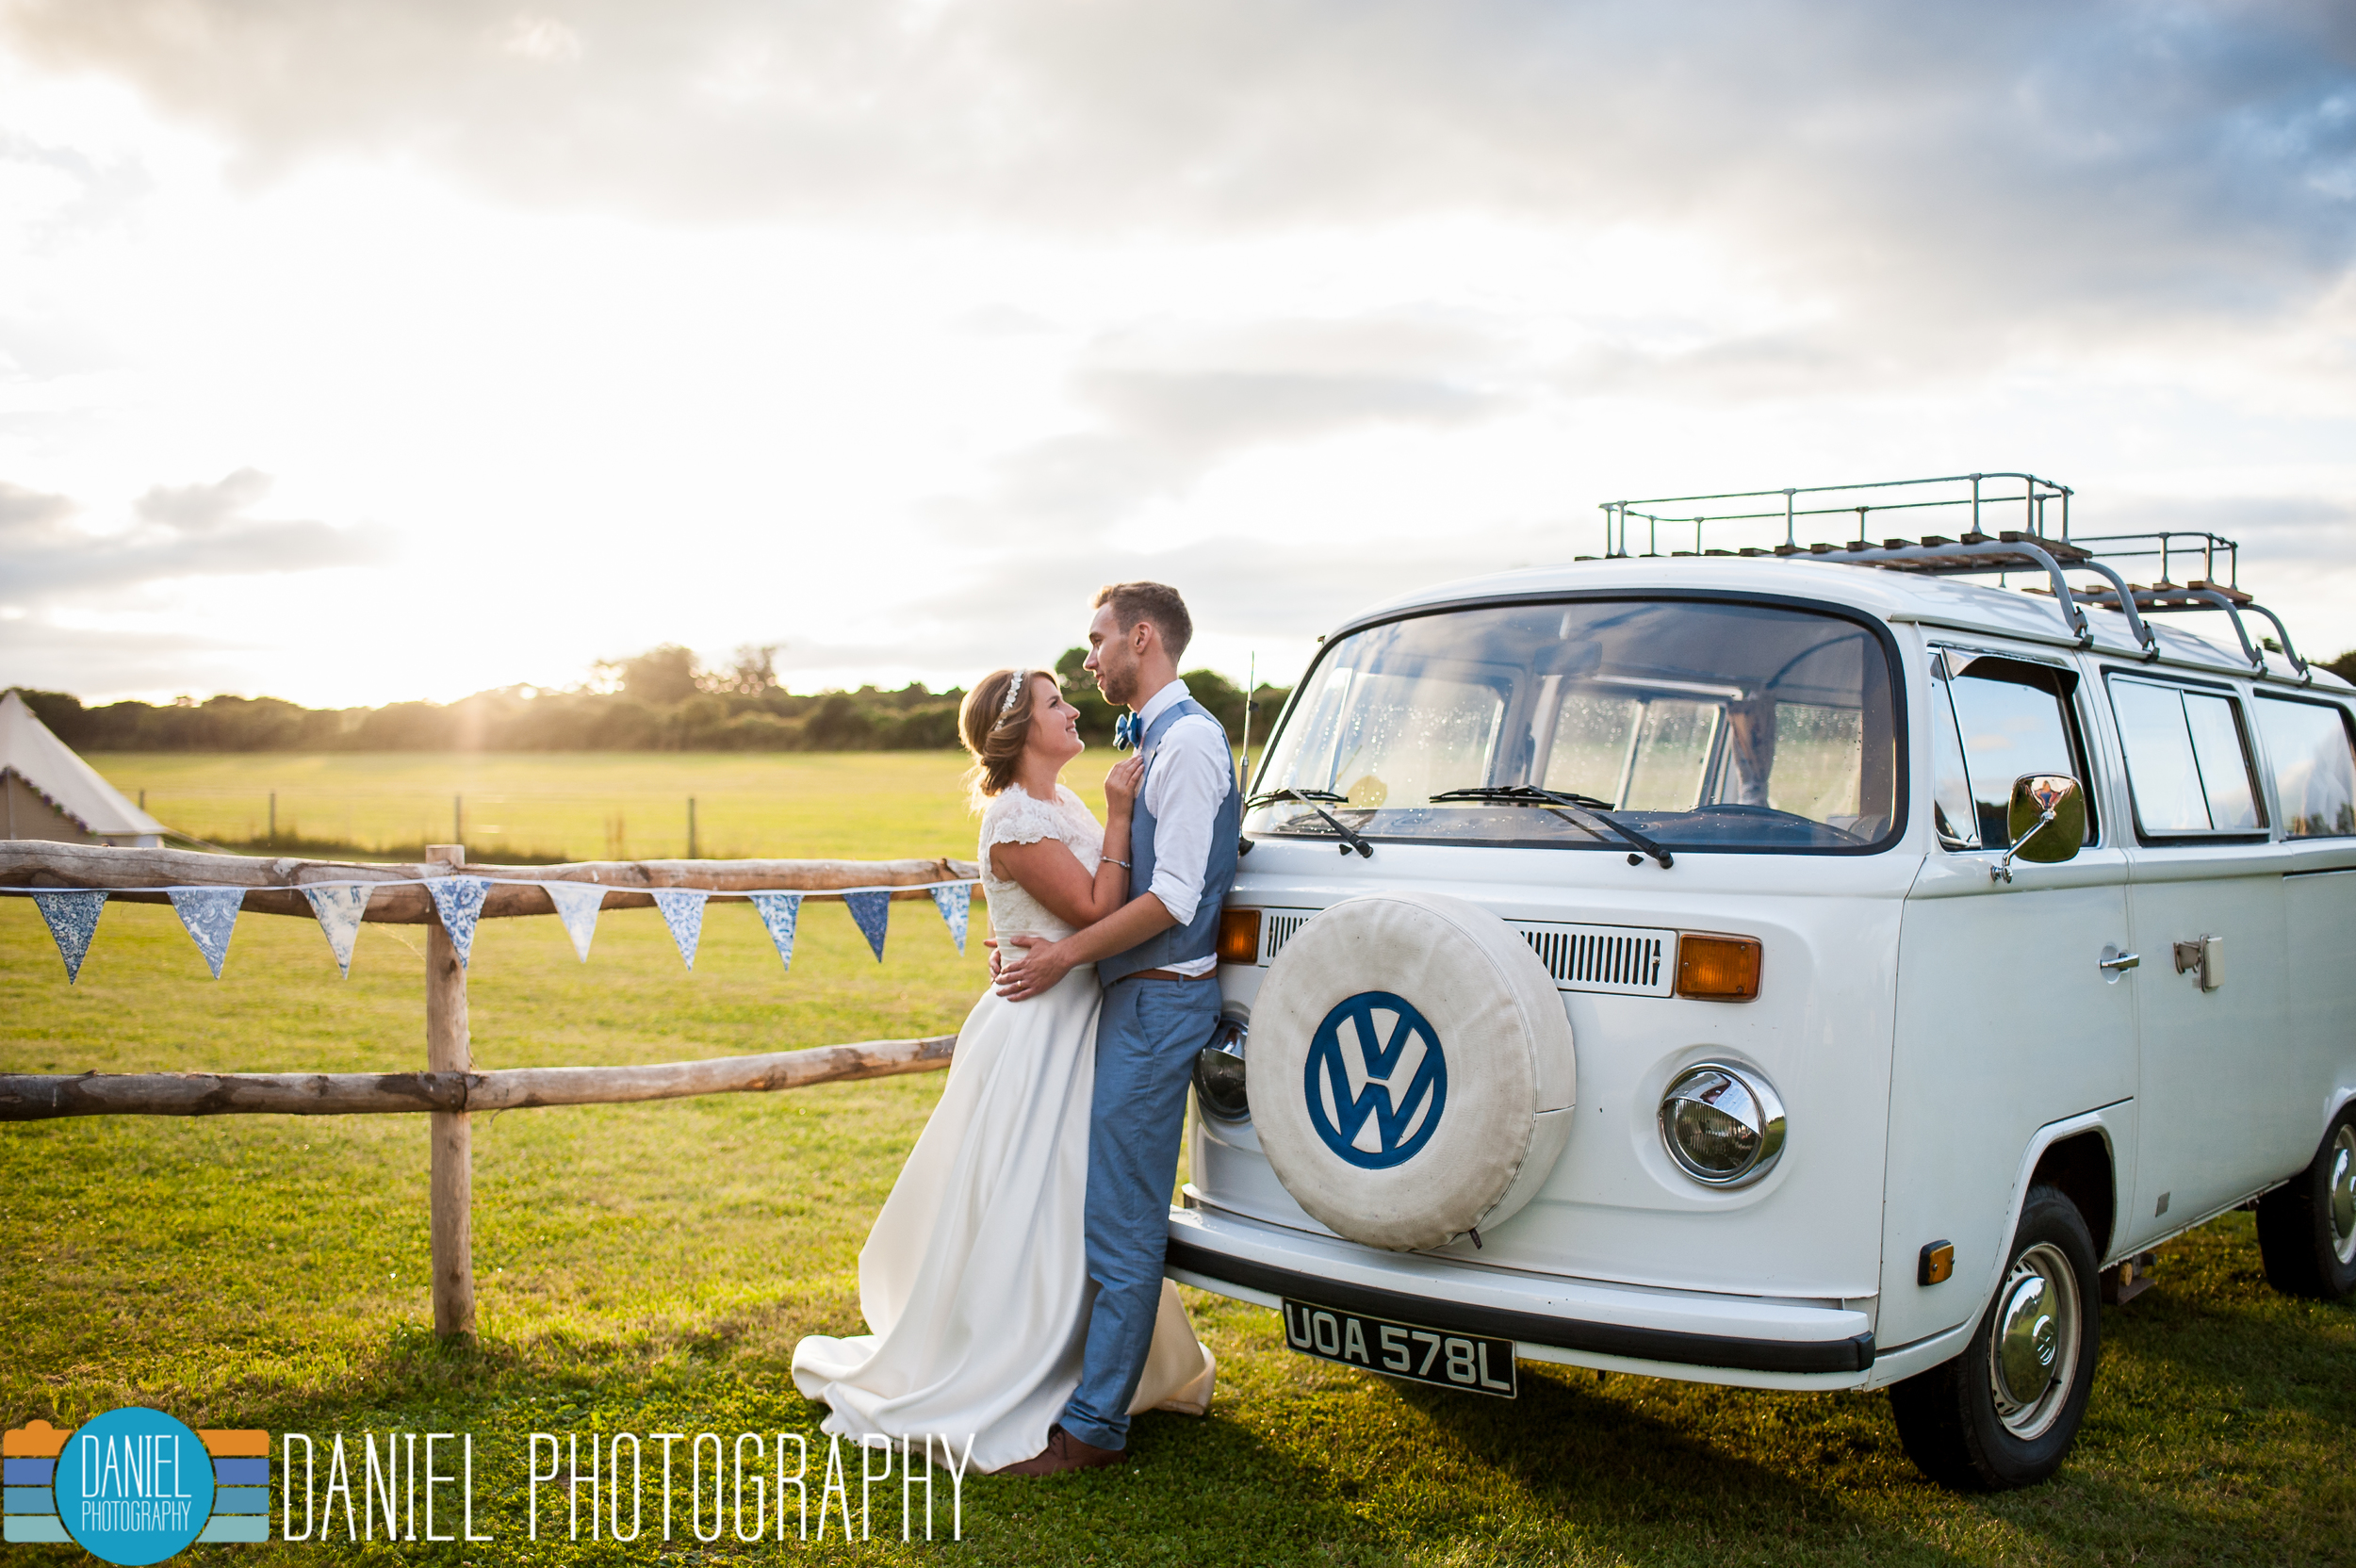 Dorset Wedding Photography, Knowlton Church, VW Camper - Daniel Photography, Hampshire Wedding Photographer